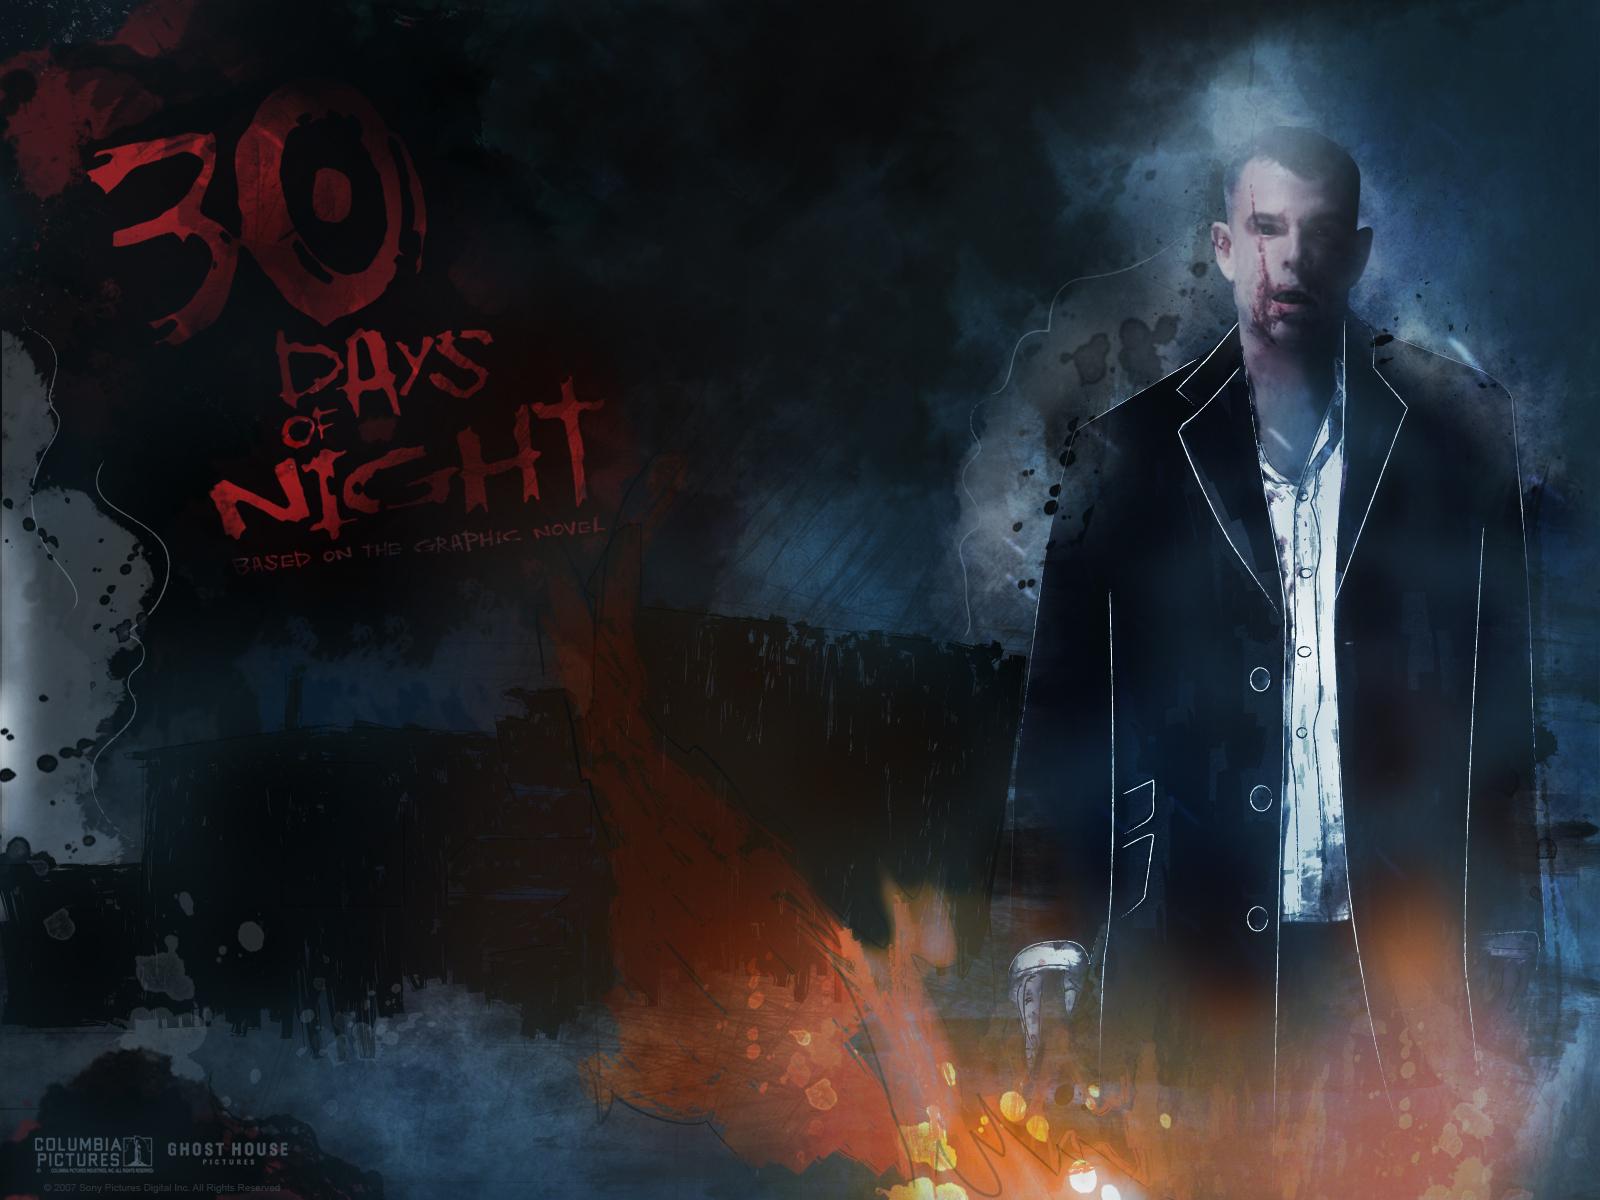 30 Days Of Night 30 Days Of Night Wallpaper 11089521 Fanpop